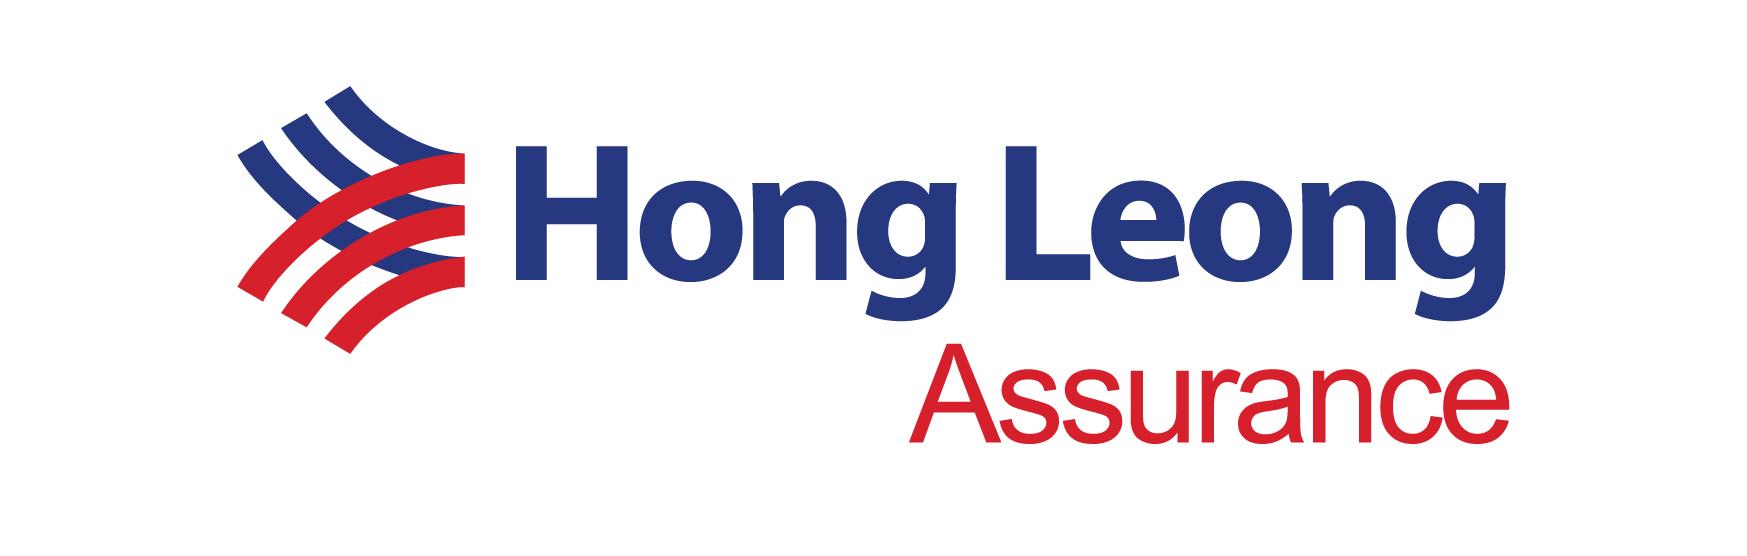 hong-leoang-assurance-logo